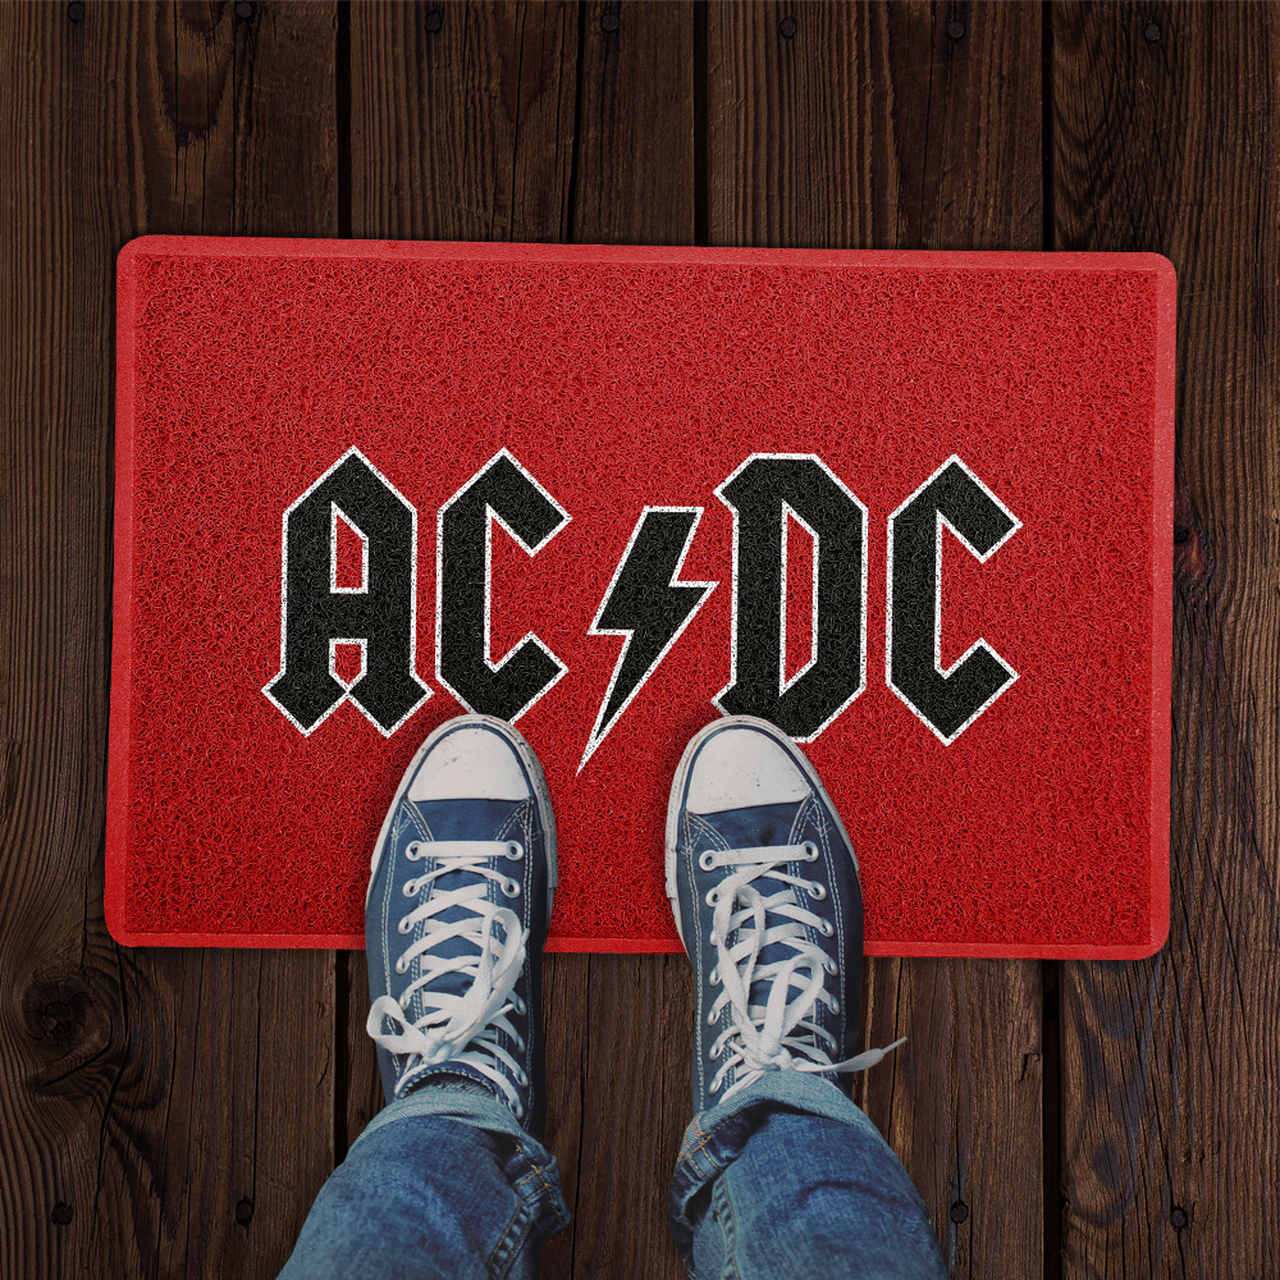 Capacho AC/DC